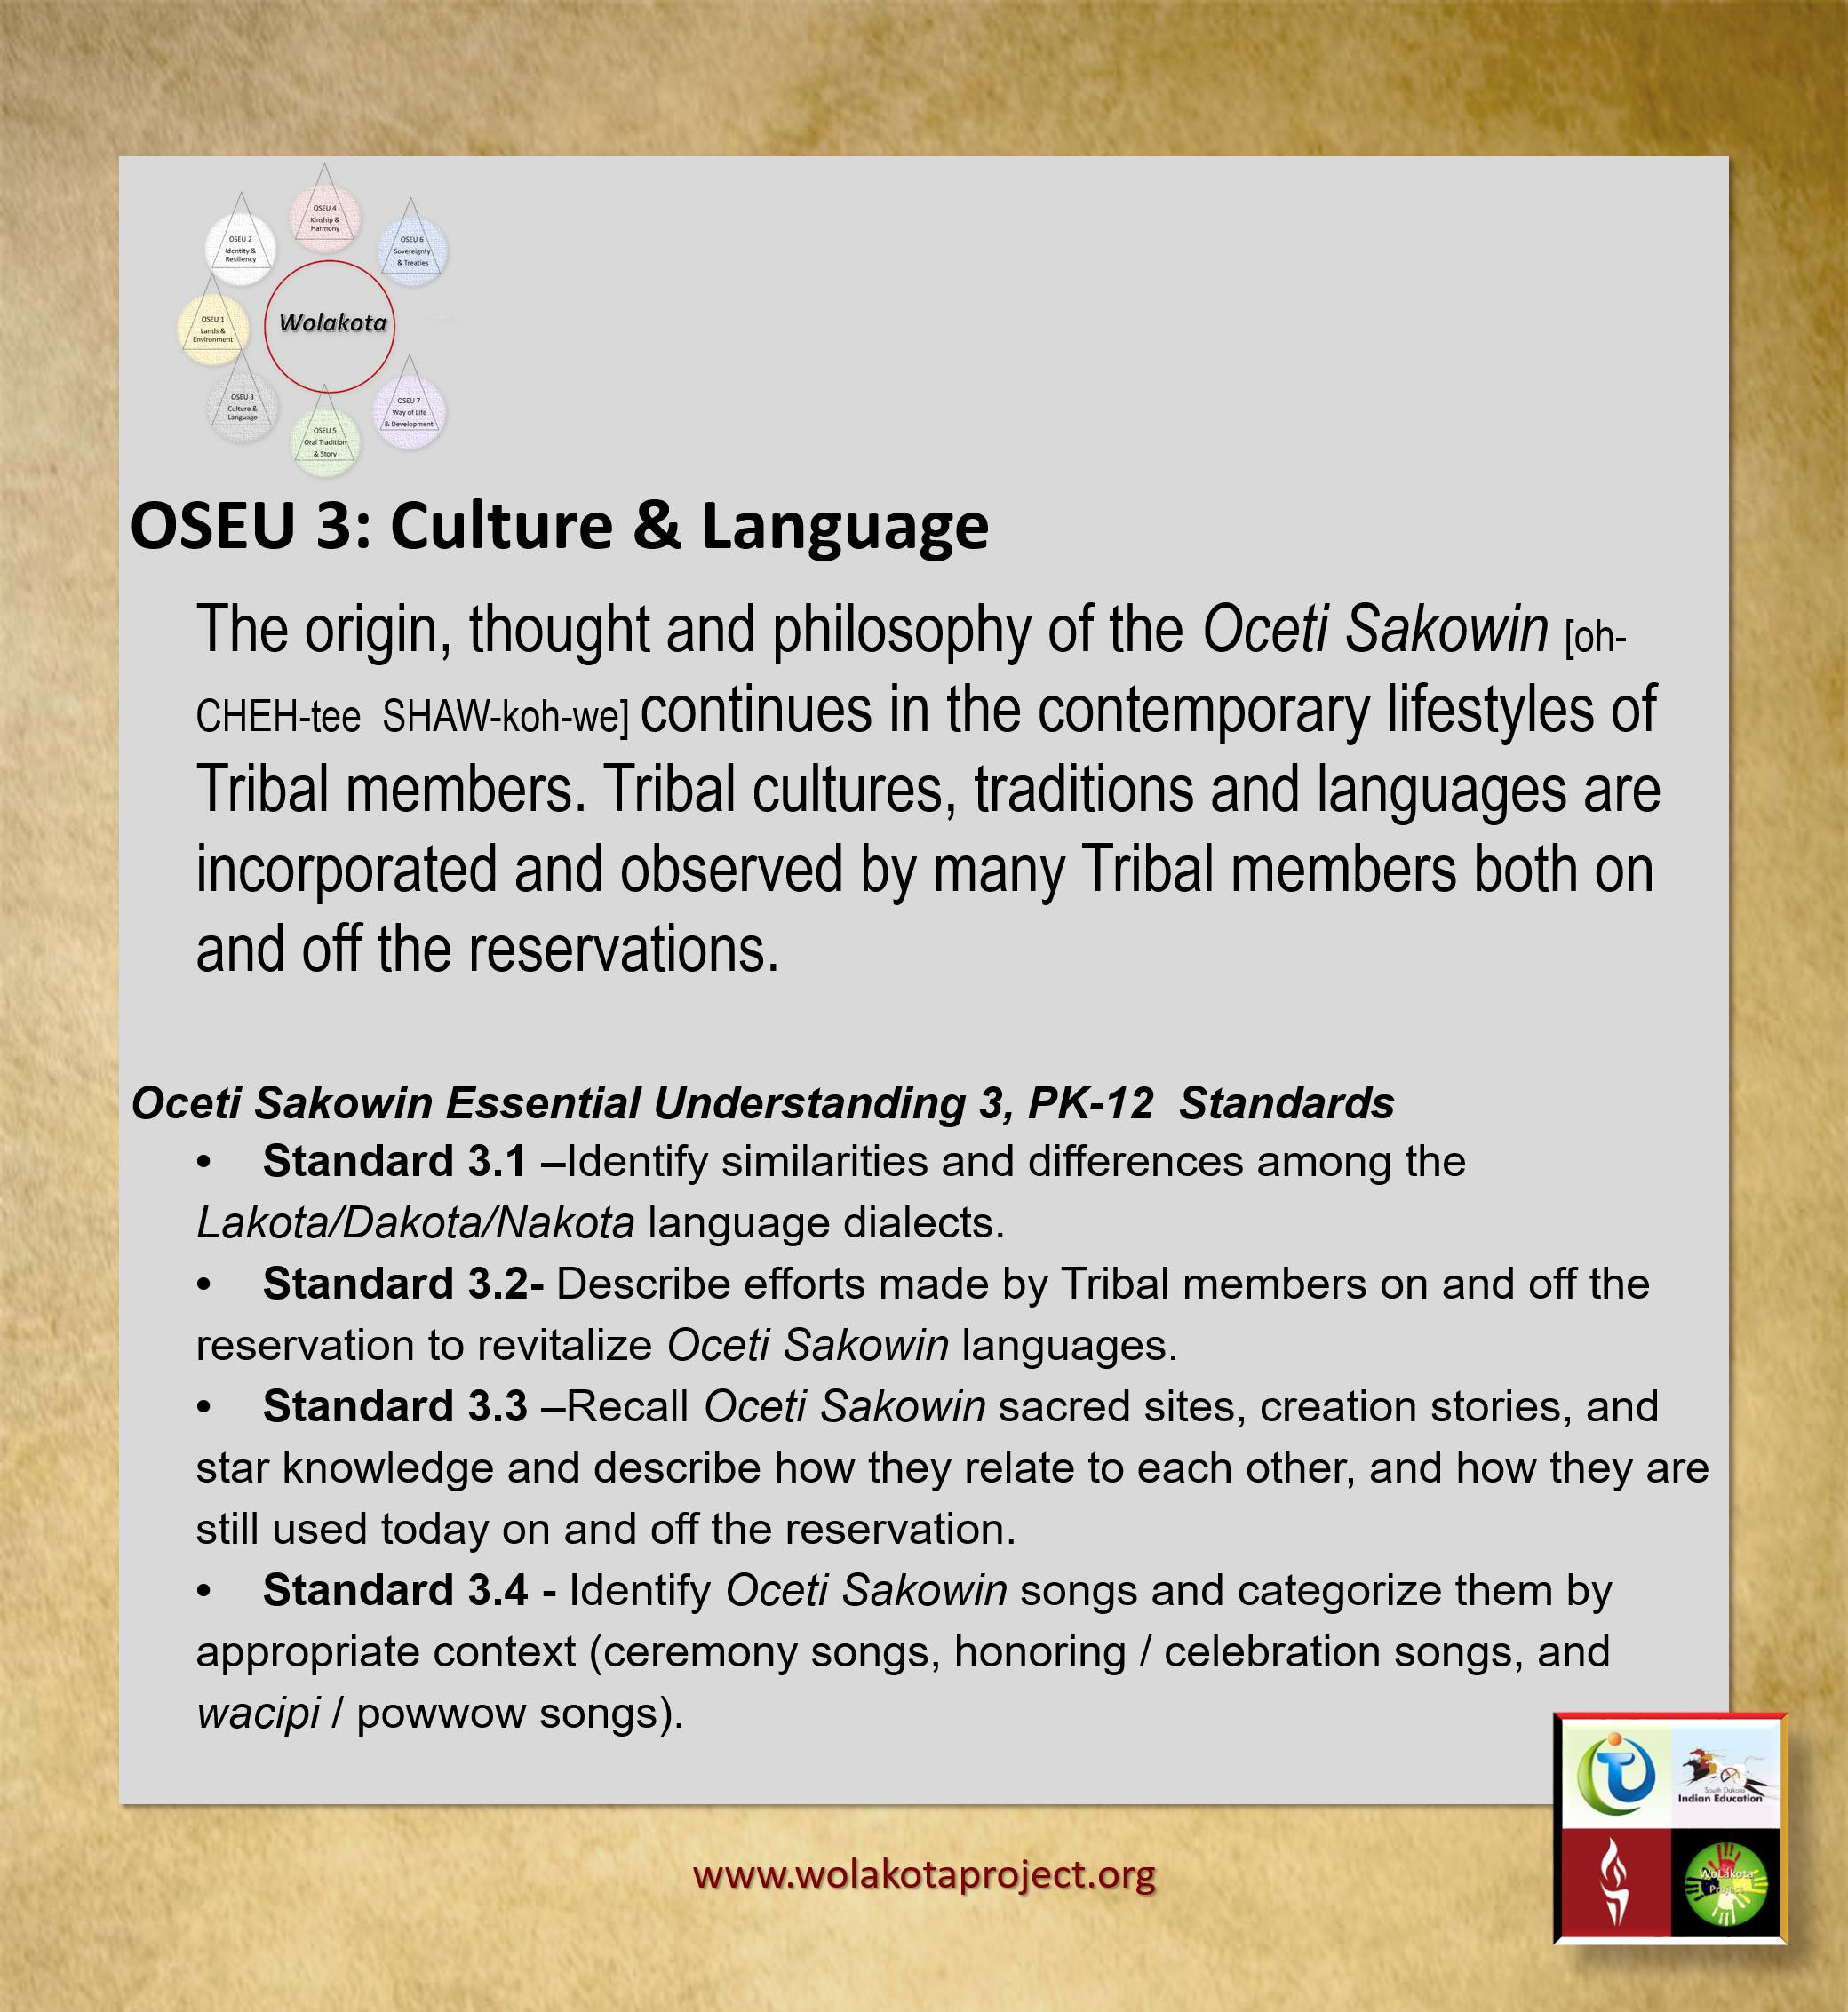 oseu-3-webpage-graphic